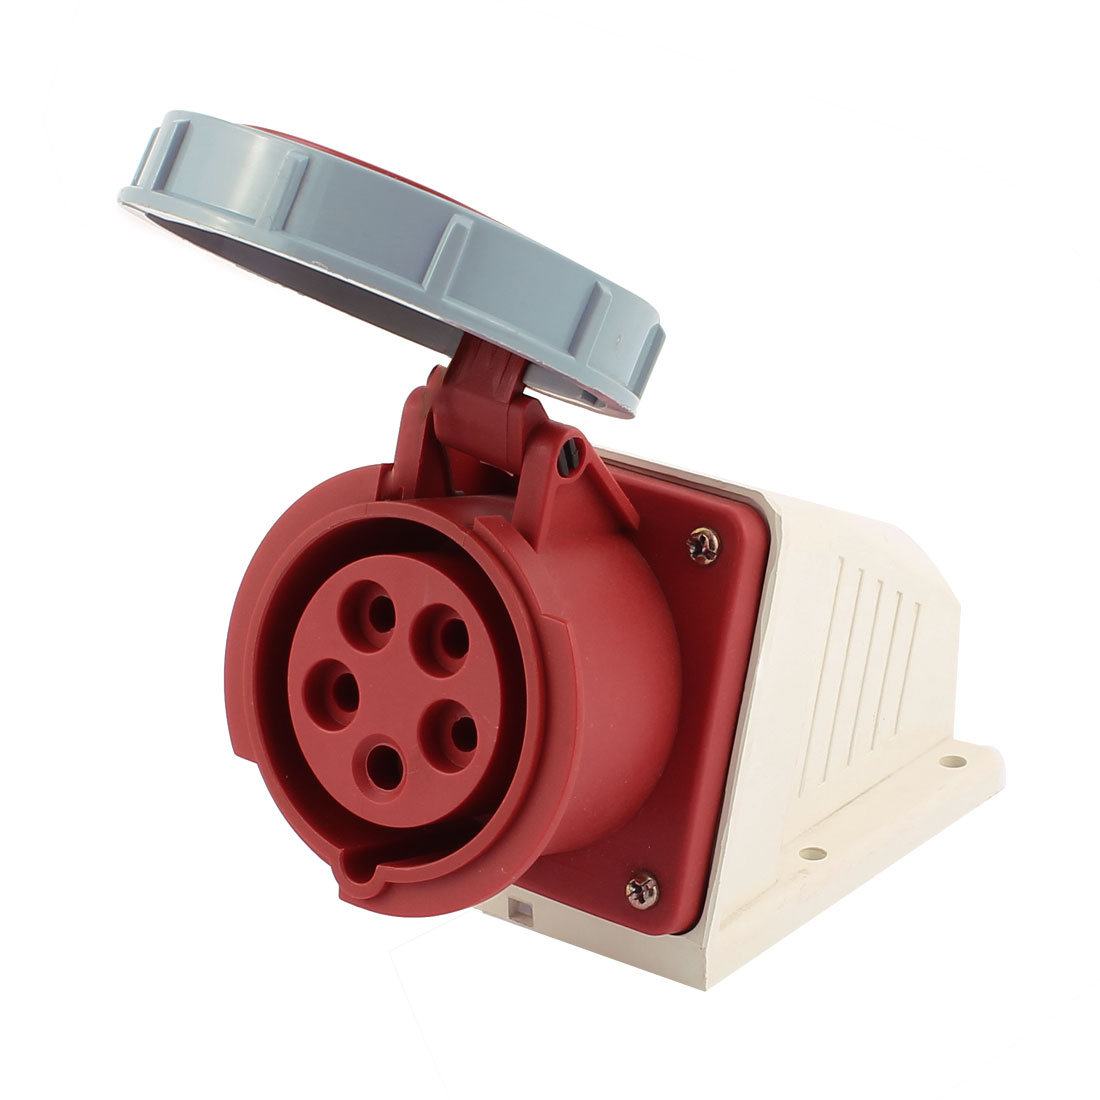 AC 220V-415V 16A IP67 3P+N+E 5P Female Industrial Caravan Socket